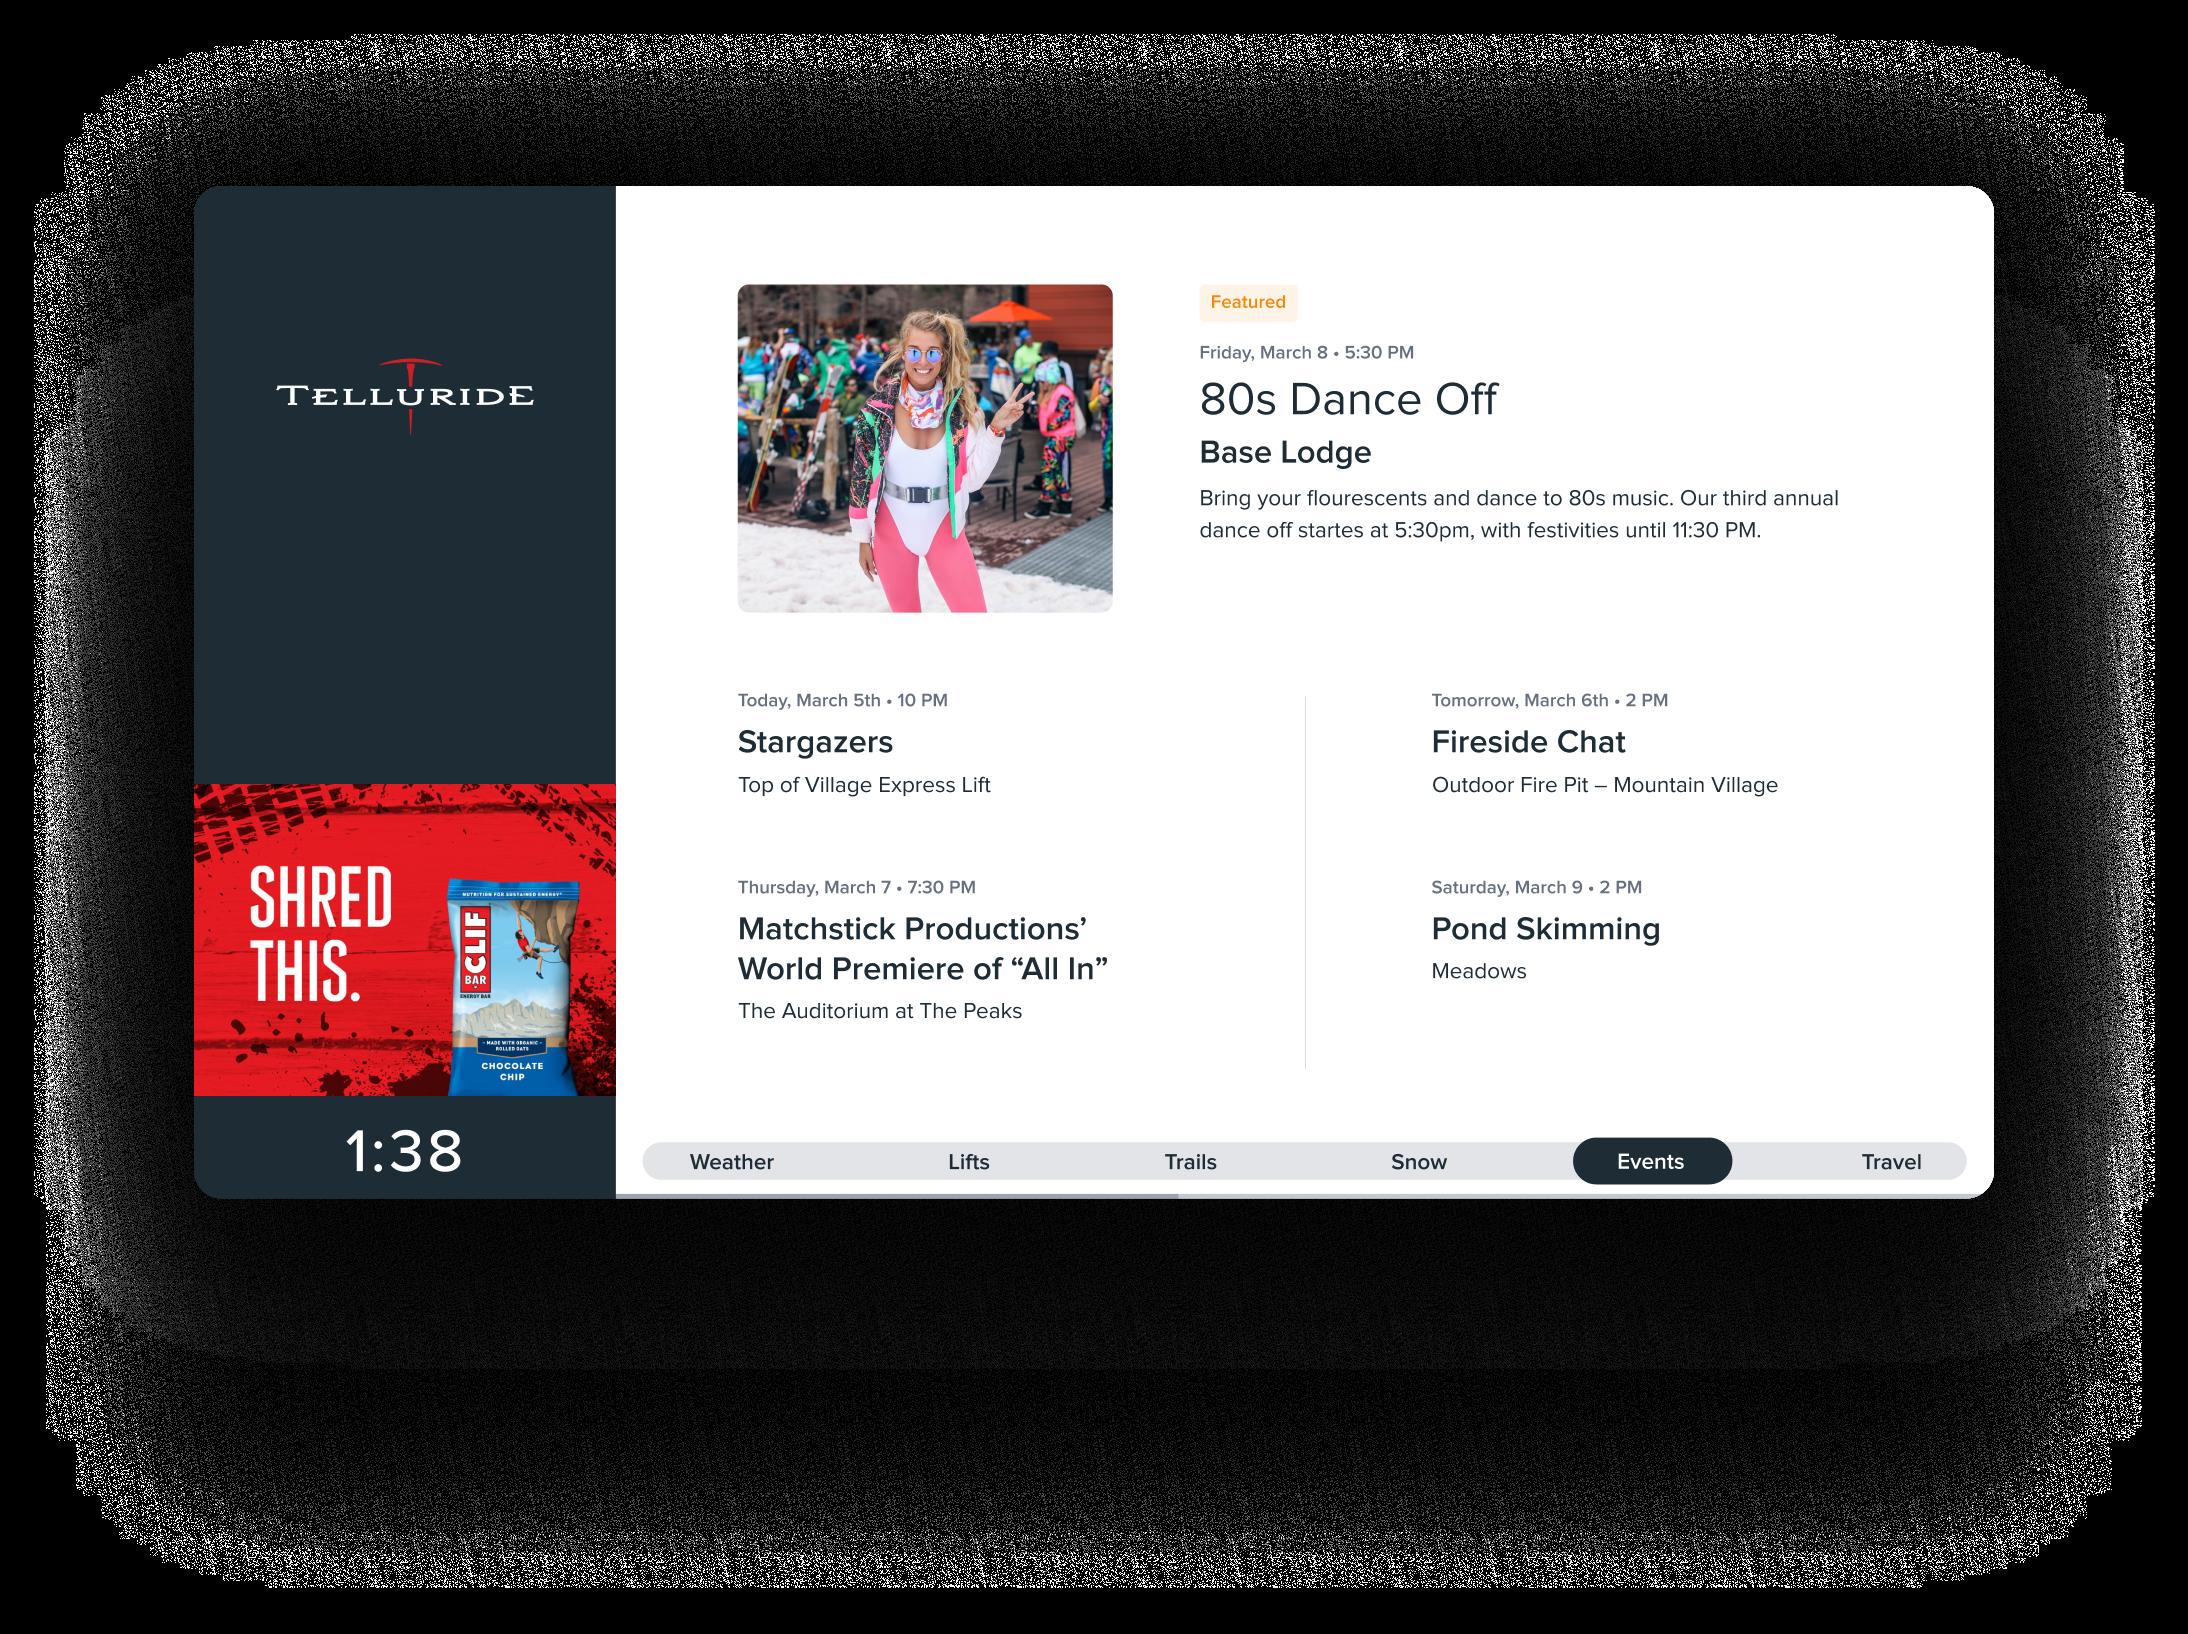 Alpine Media - Telluride display - Events - Clif Bar